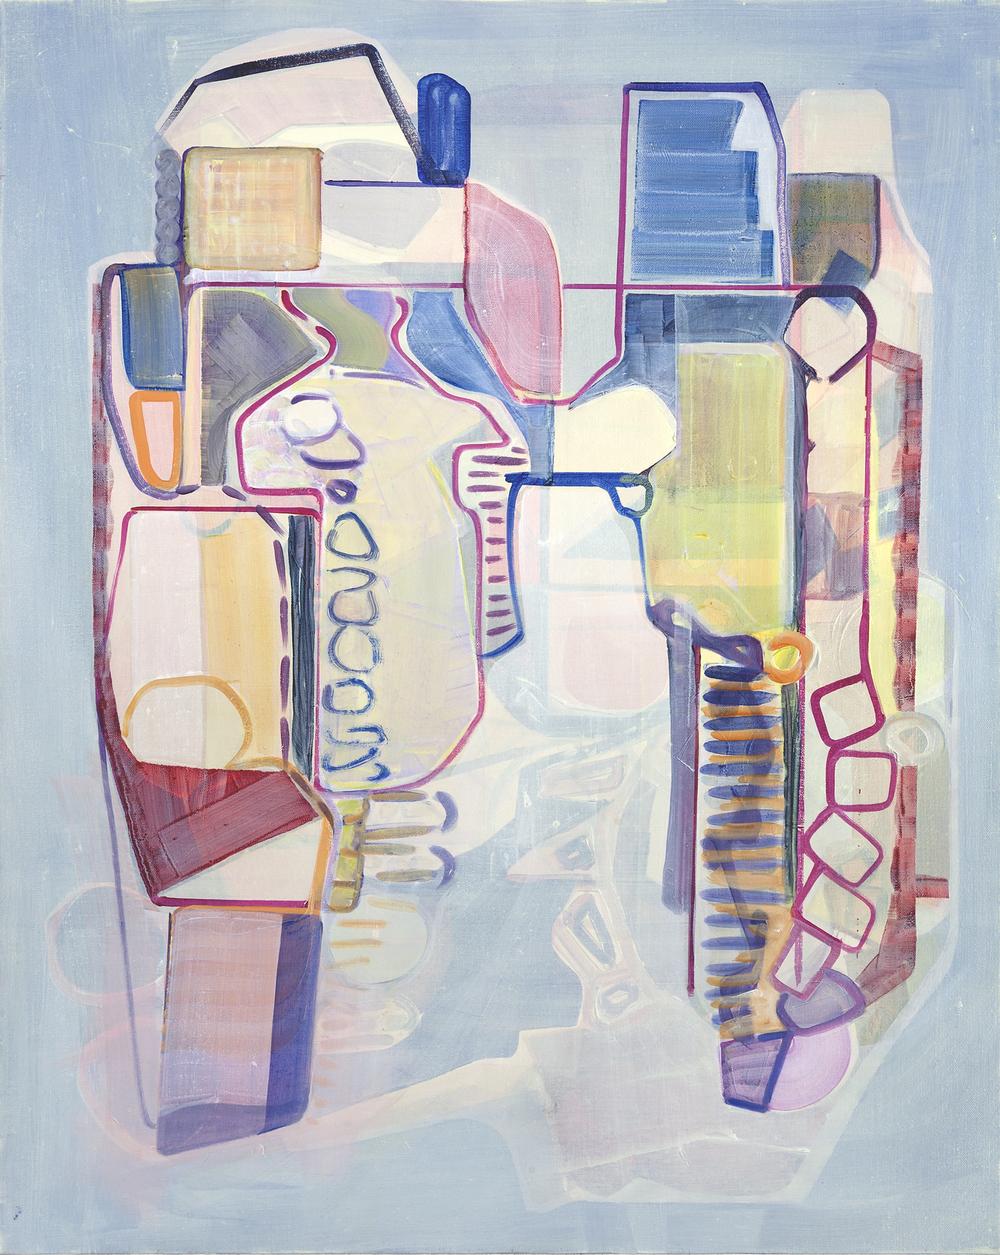 Constructor, oil on canvas, 65cm x 47cm, 2013